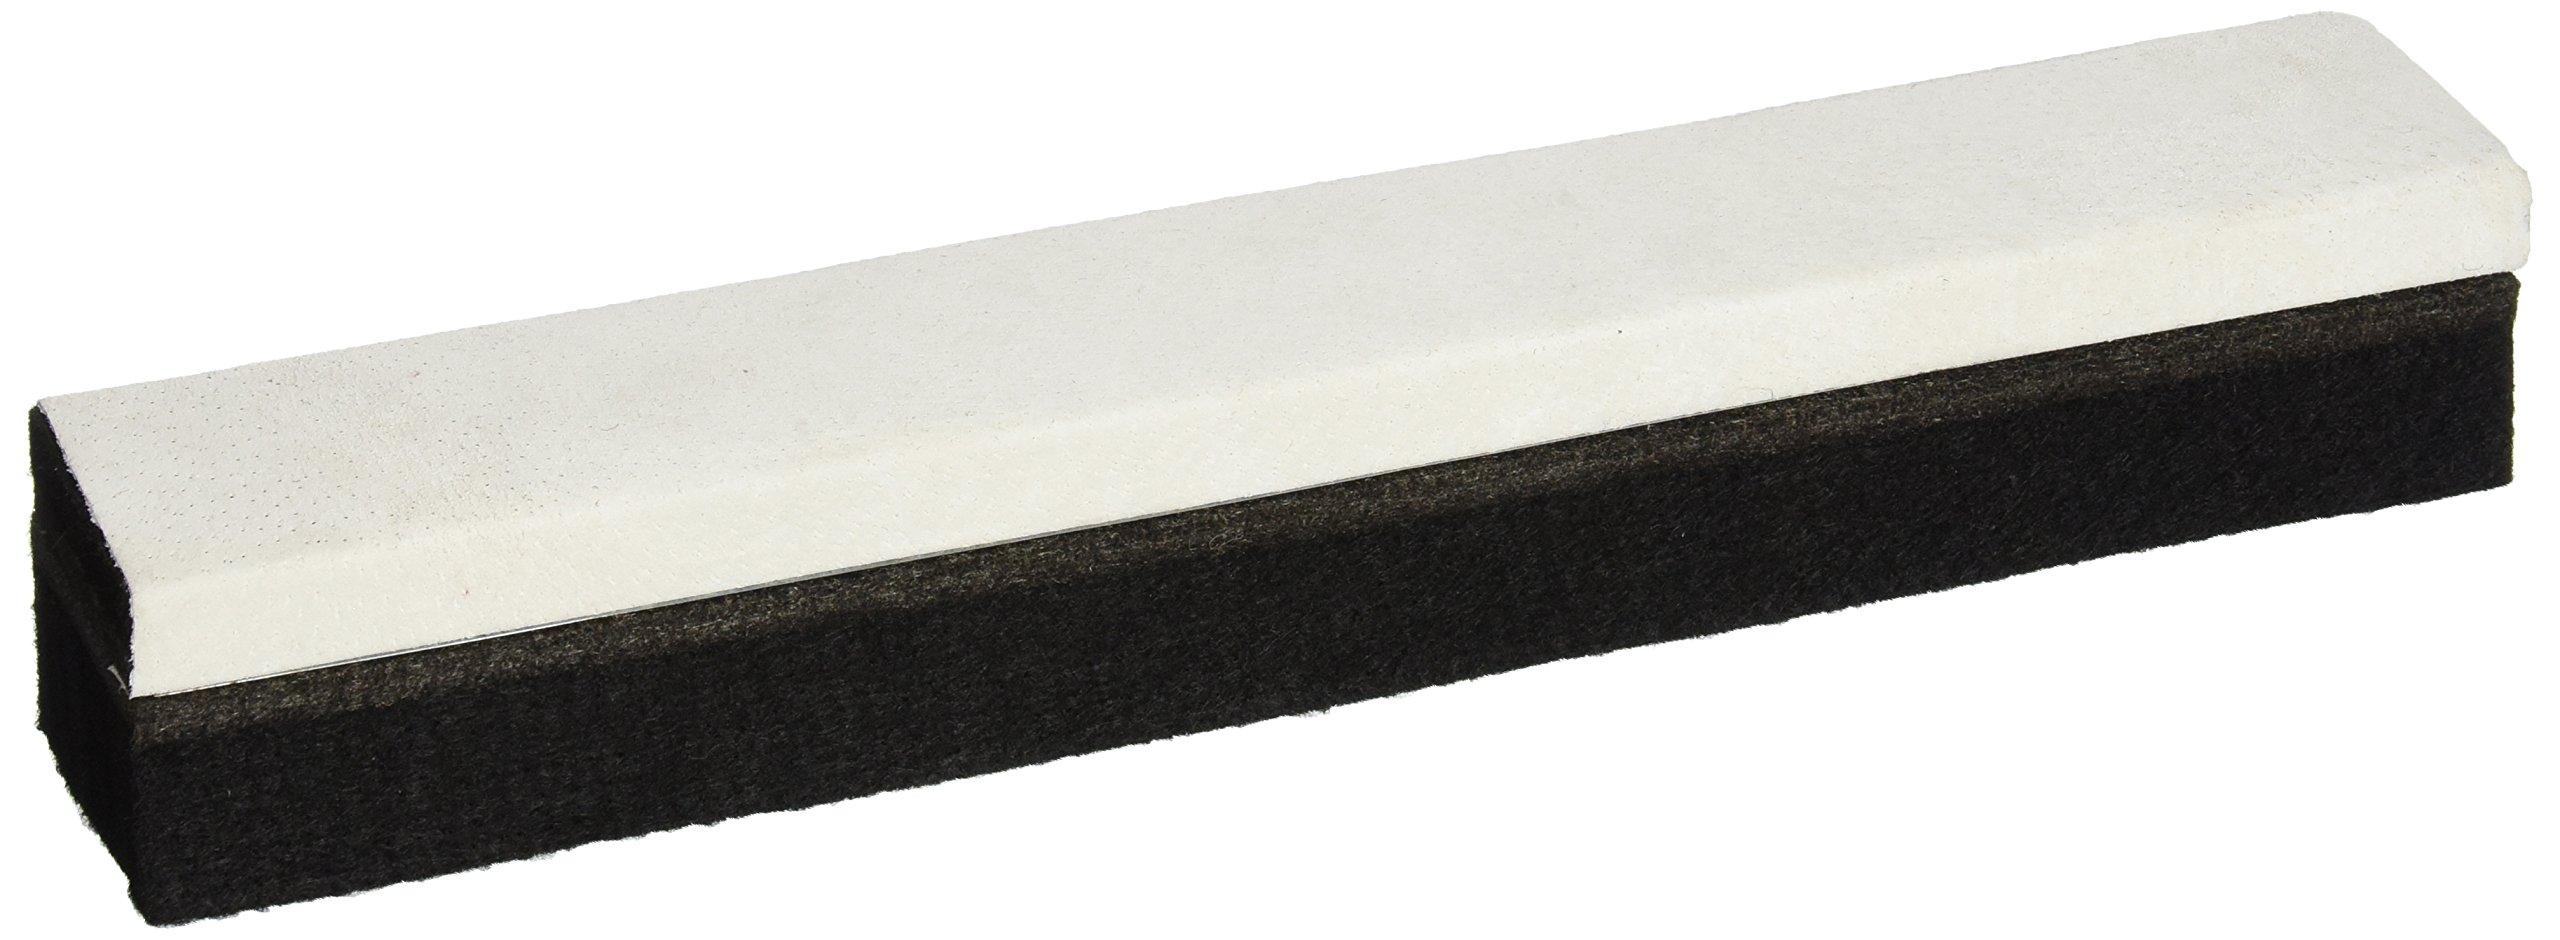 Quartet 807222 Deluxe Laminated Felt Chalkboard Eraser/Cleaner, 12 x 2 x 1-5/8 by Quartet